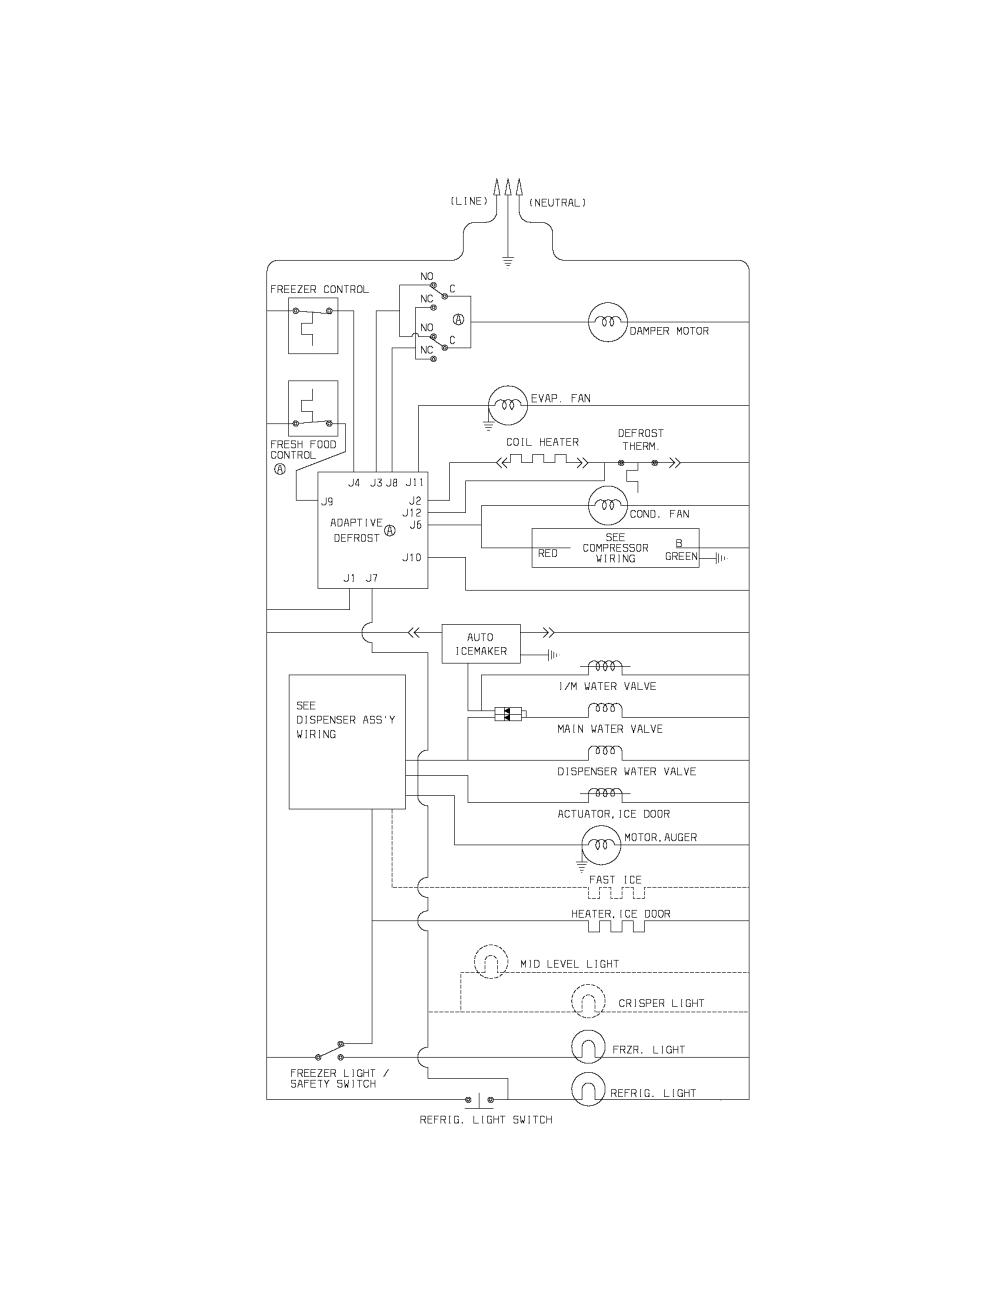 medium resolution of ge oven wiring diagram further kenmore refrigerator schematic diagram